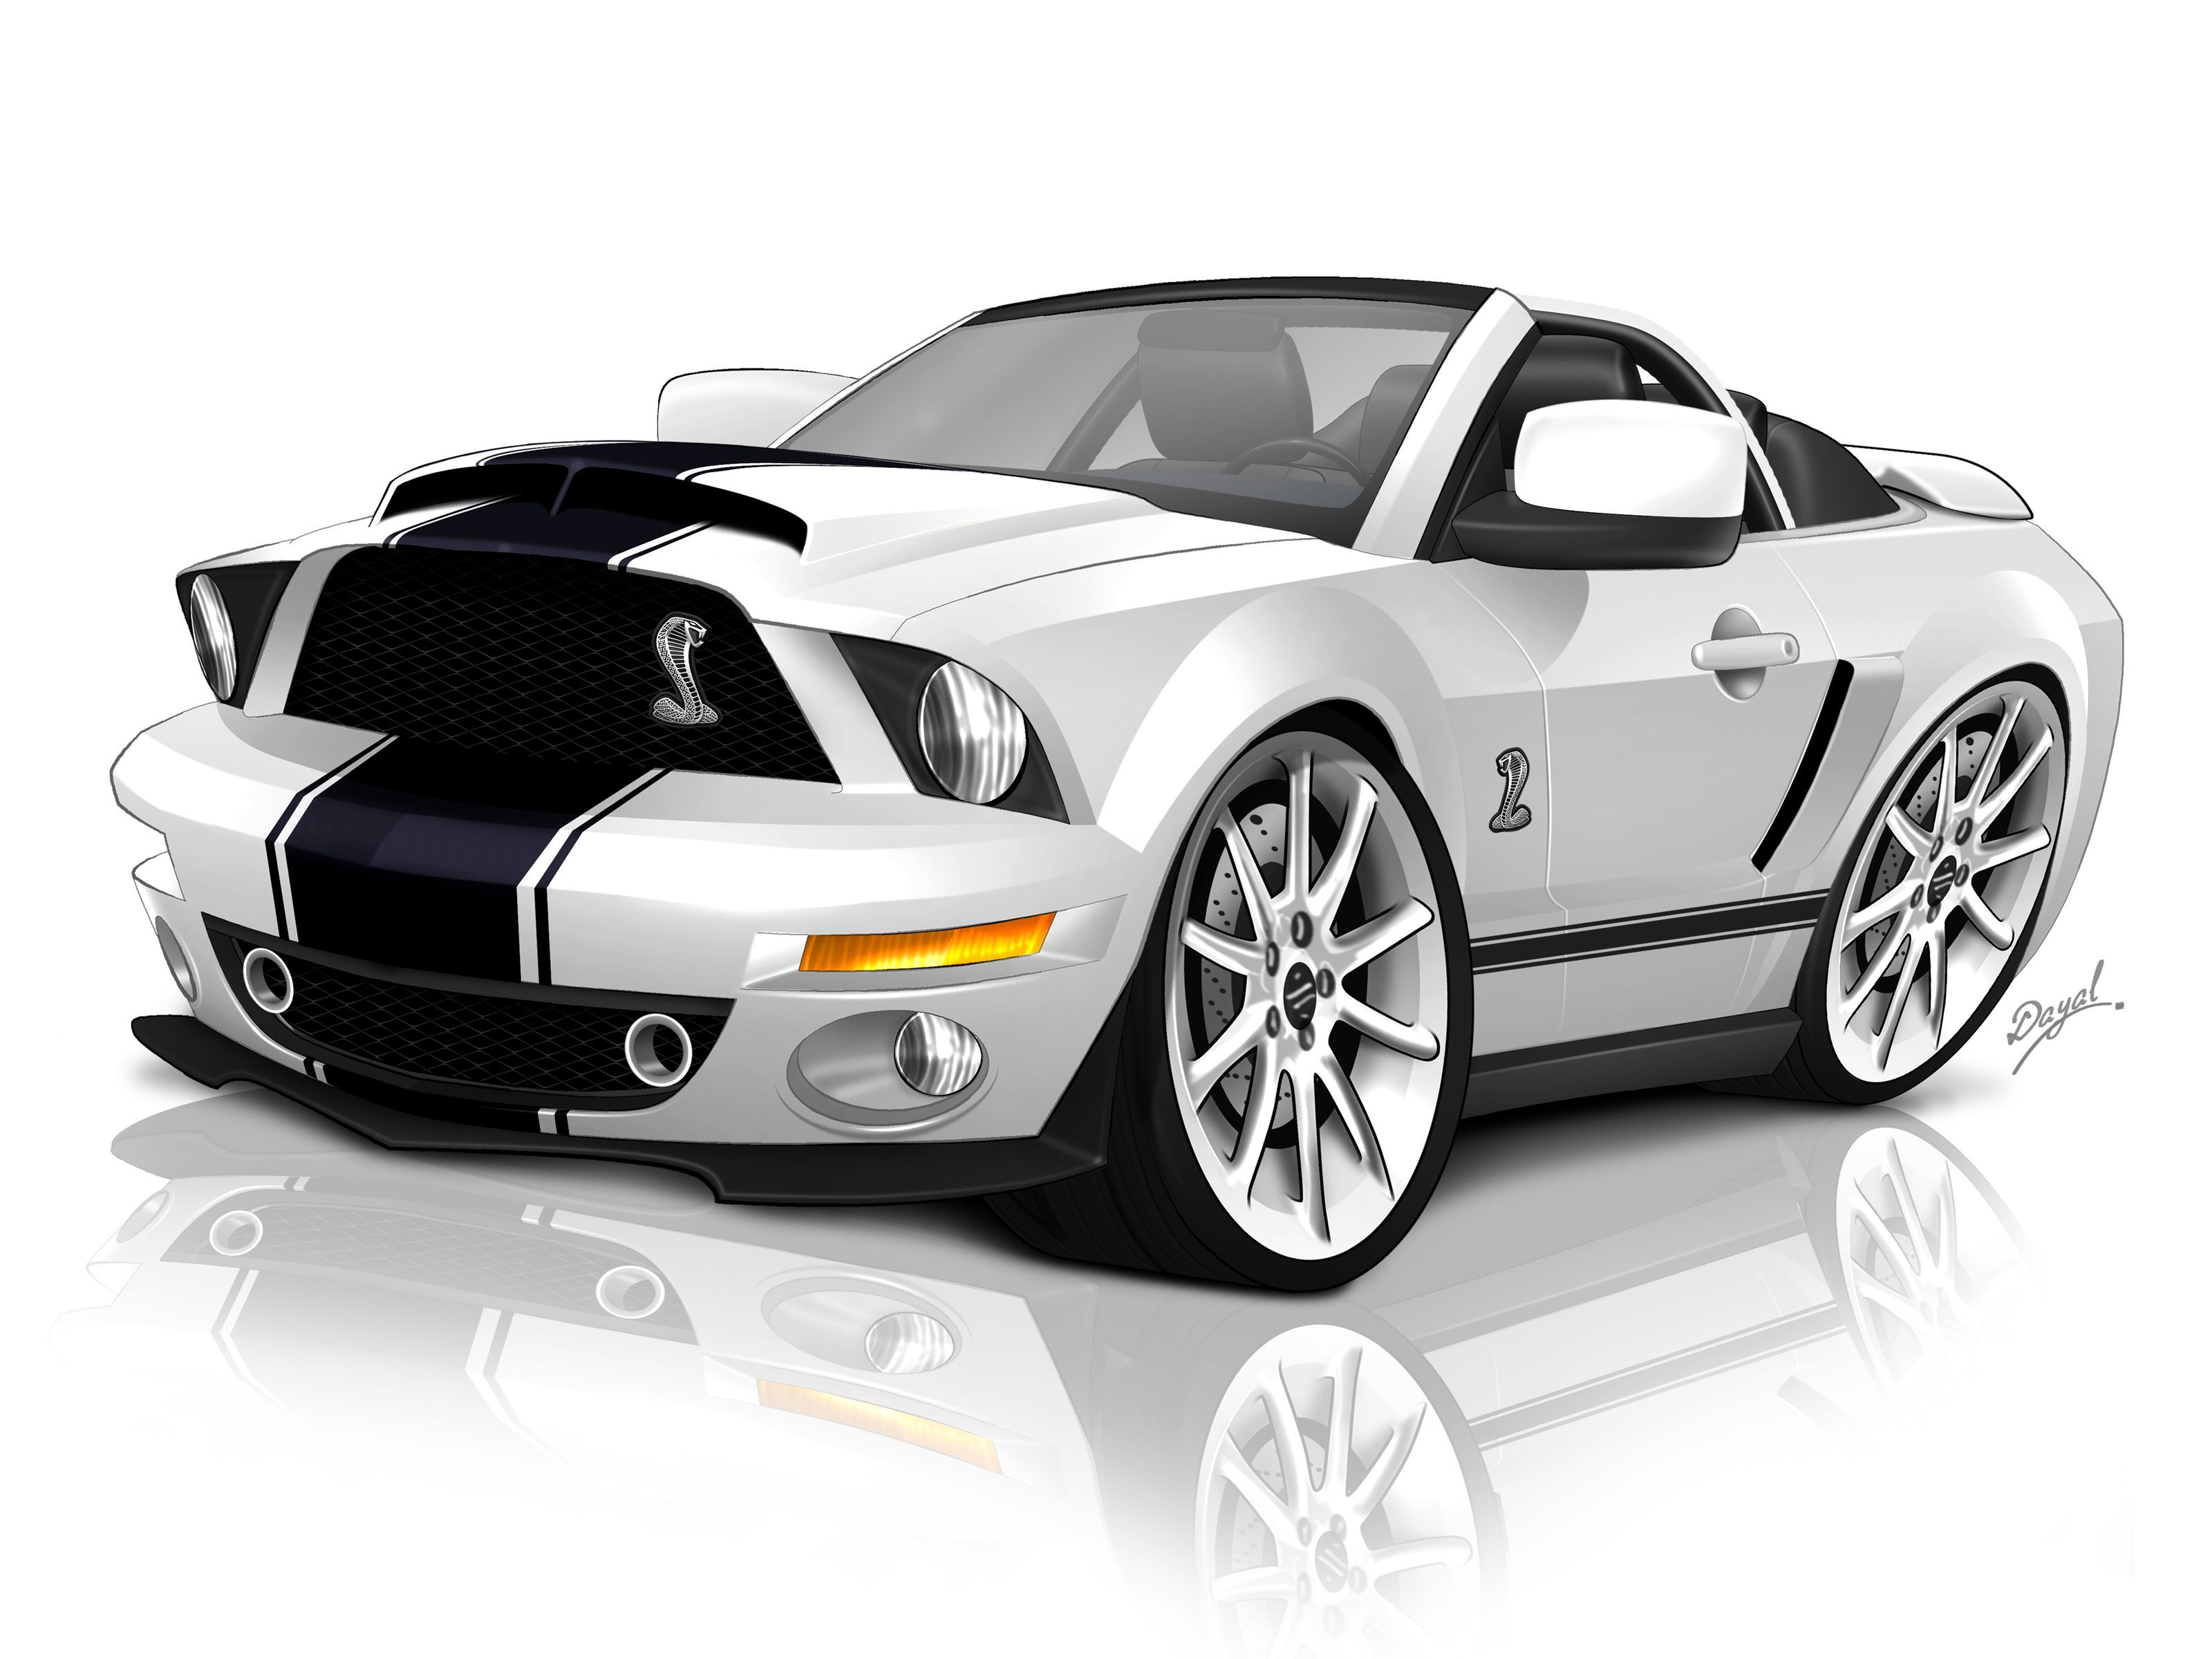 Cartoons Muscle Car Wallpapers Top Free Cartoons Muscle Car